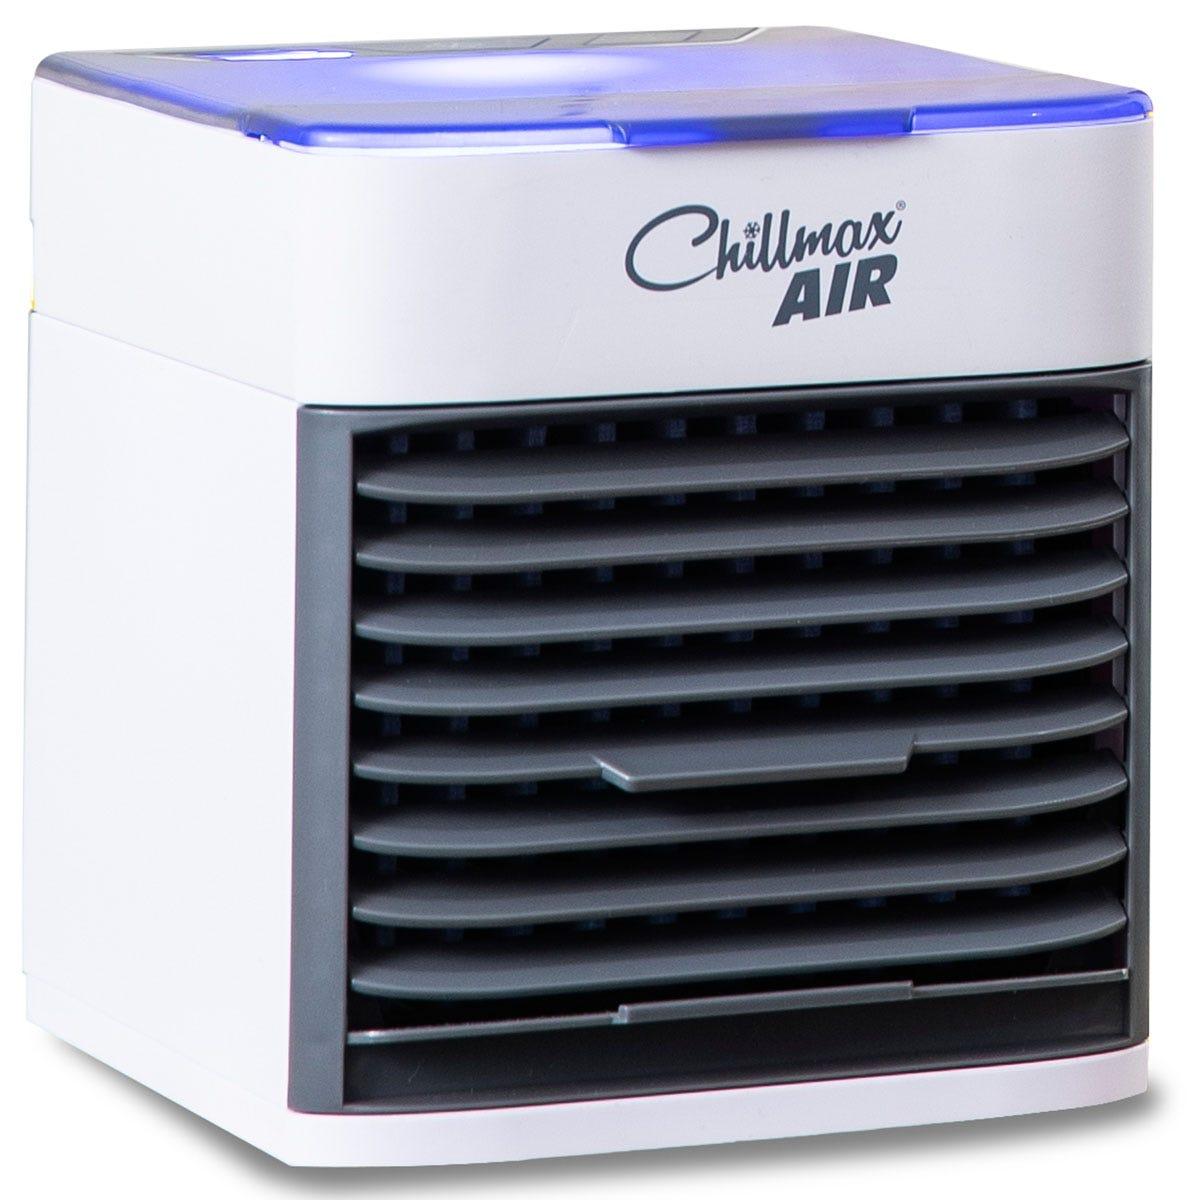 JML A000841 ChillMax Air 10W Personal Space Air Cooler and Humidifier - White